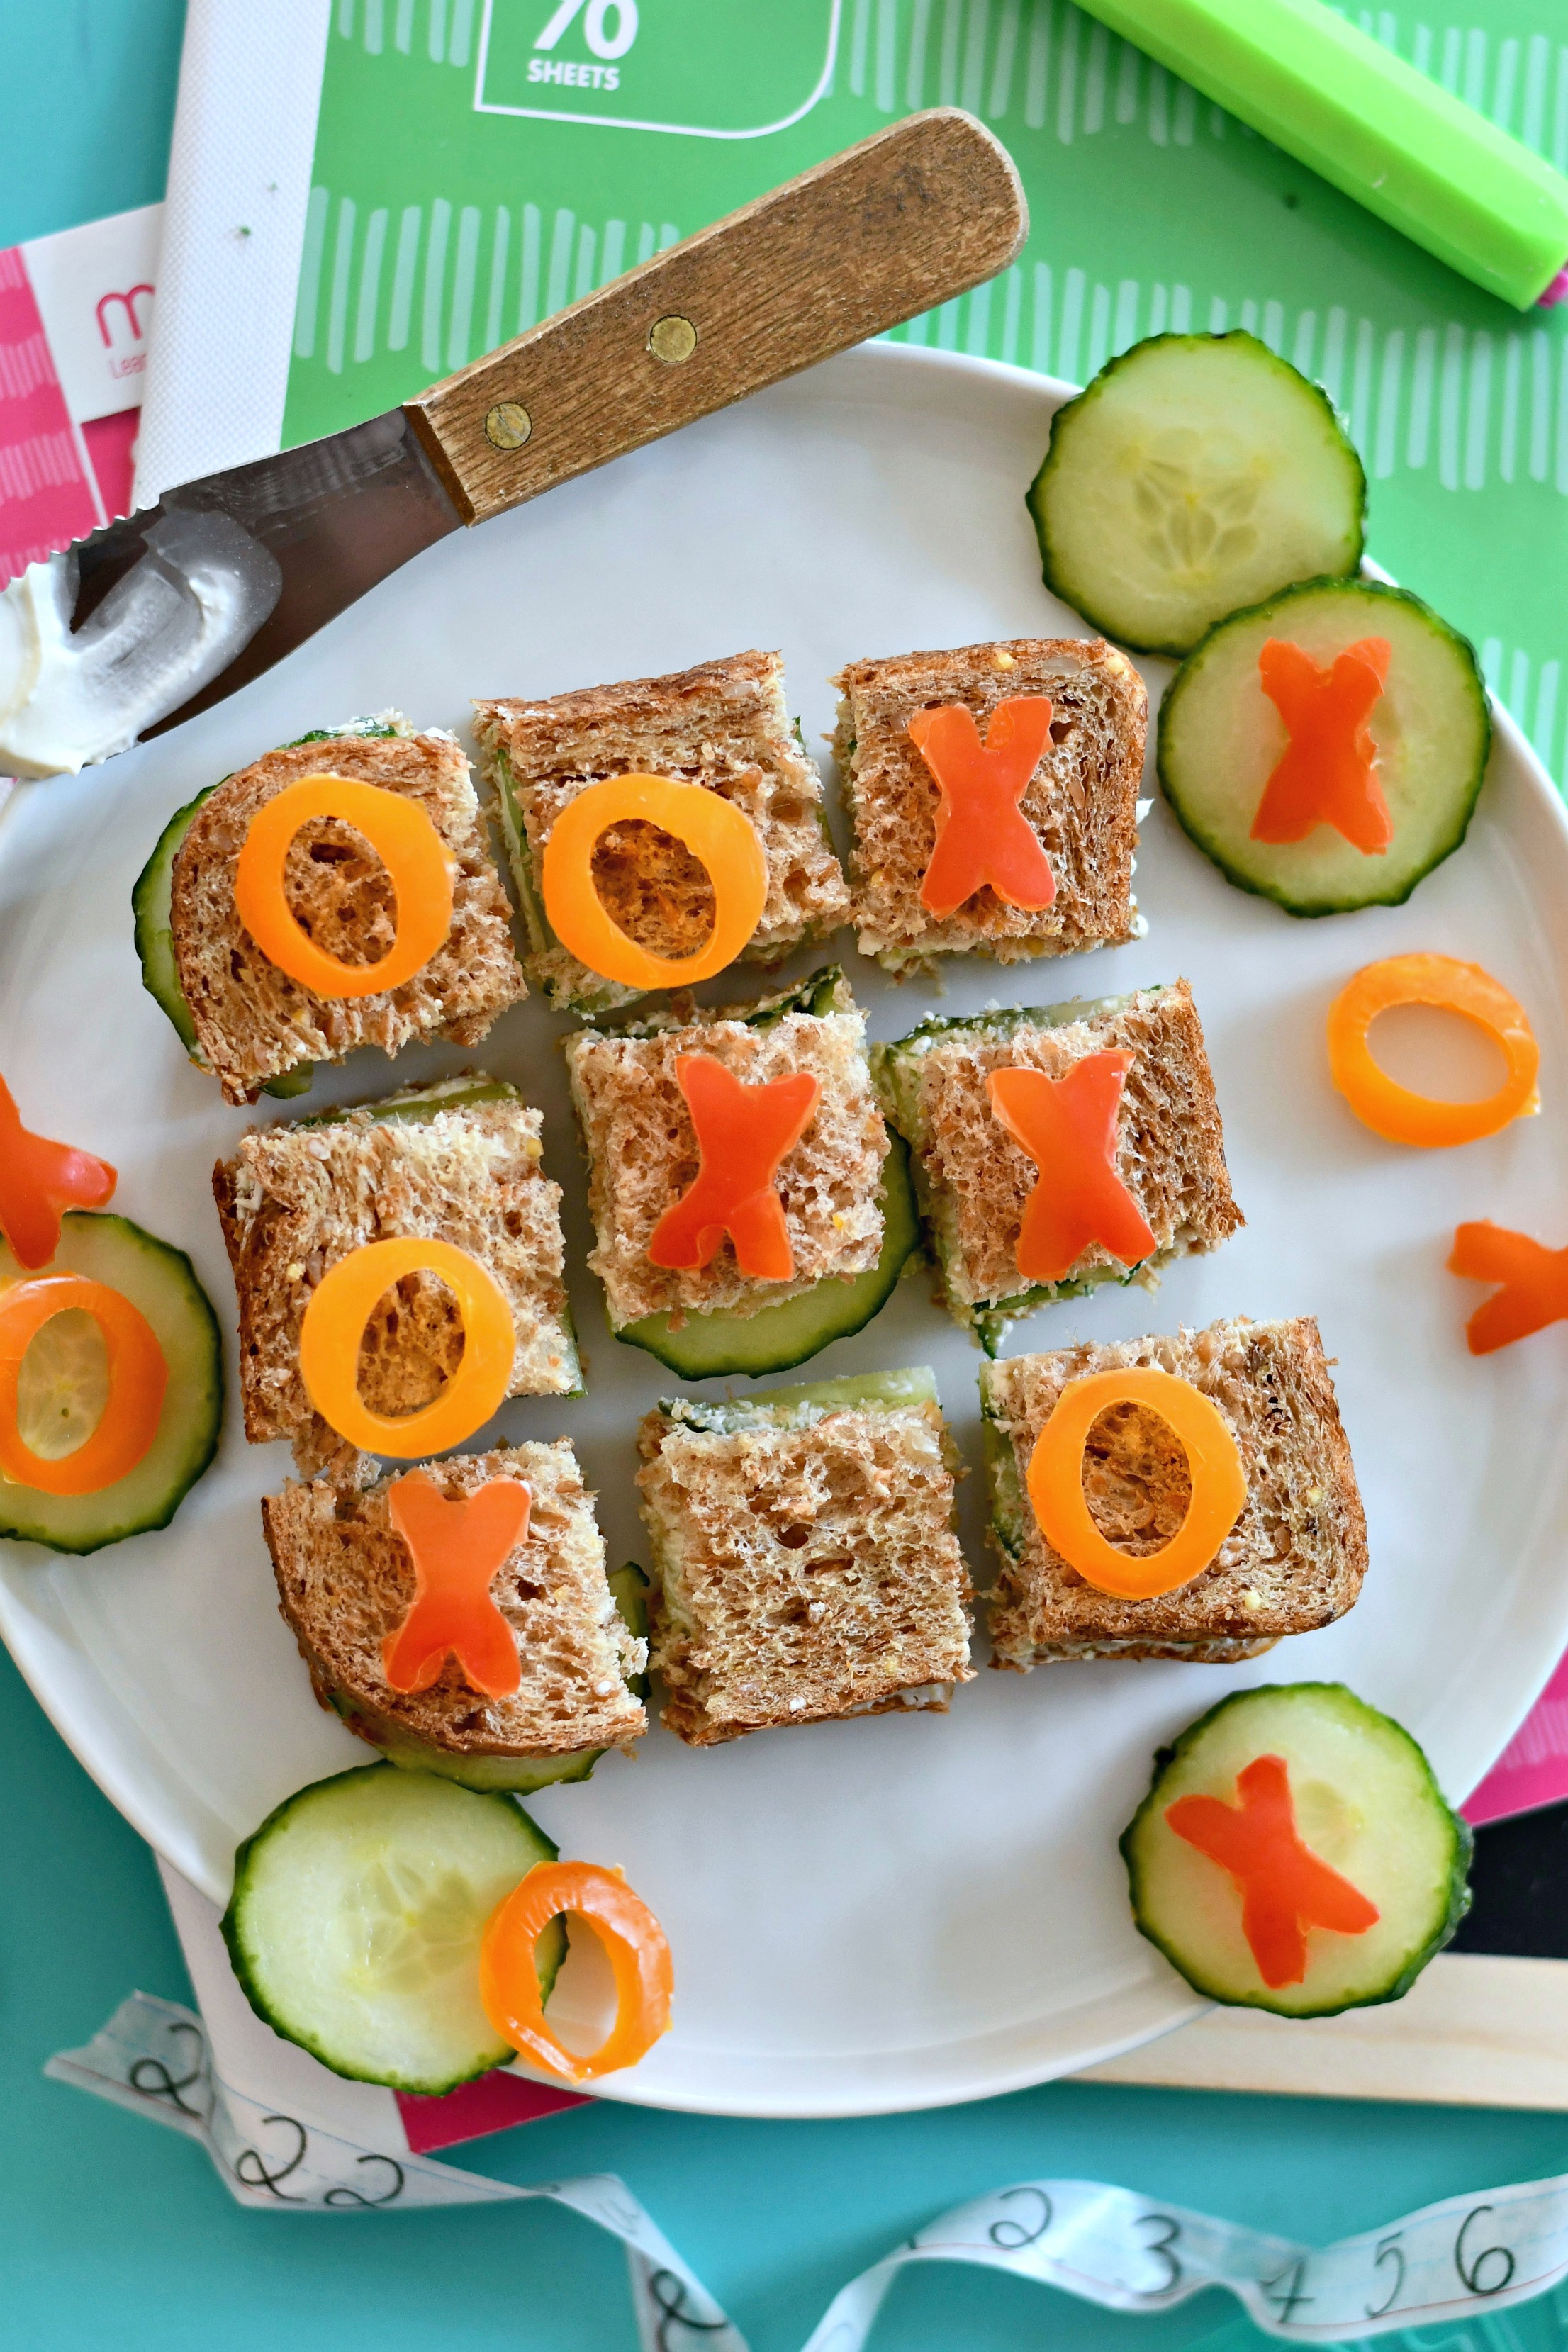 Tic Tac Toe Sandwiches